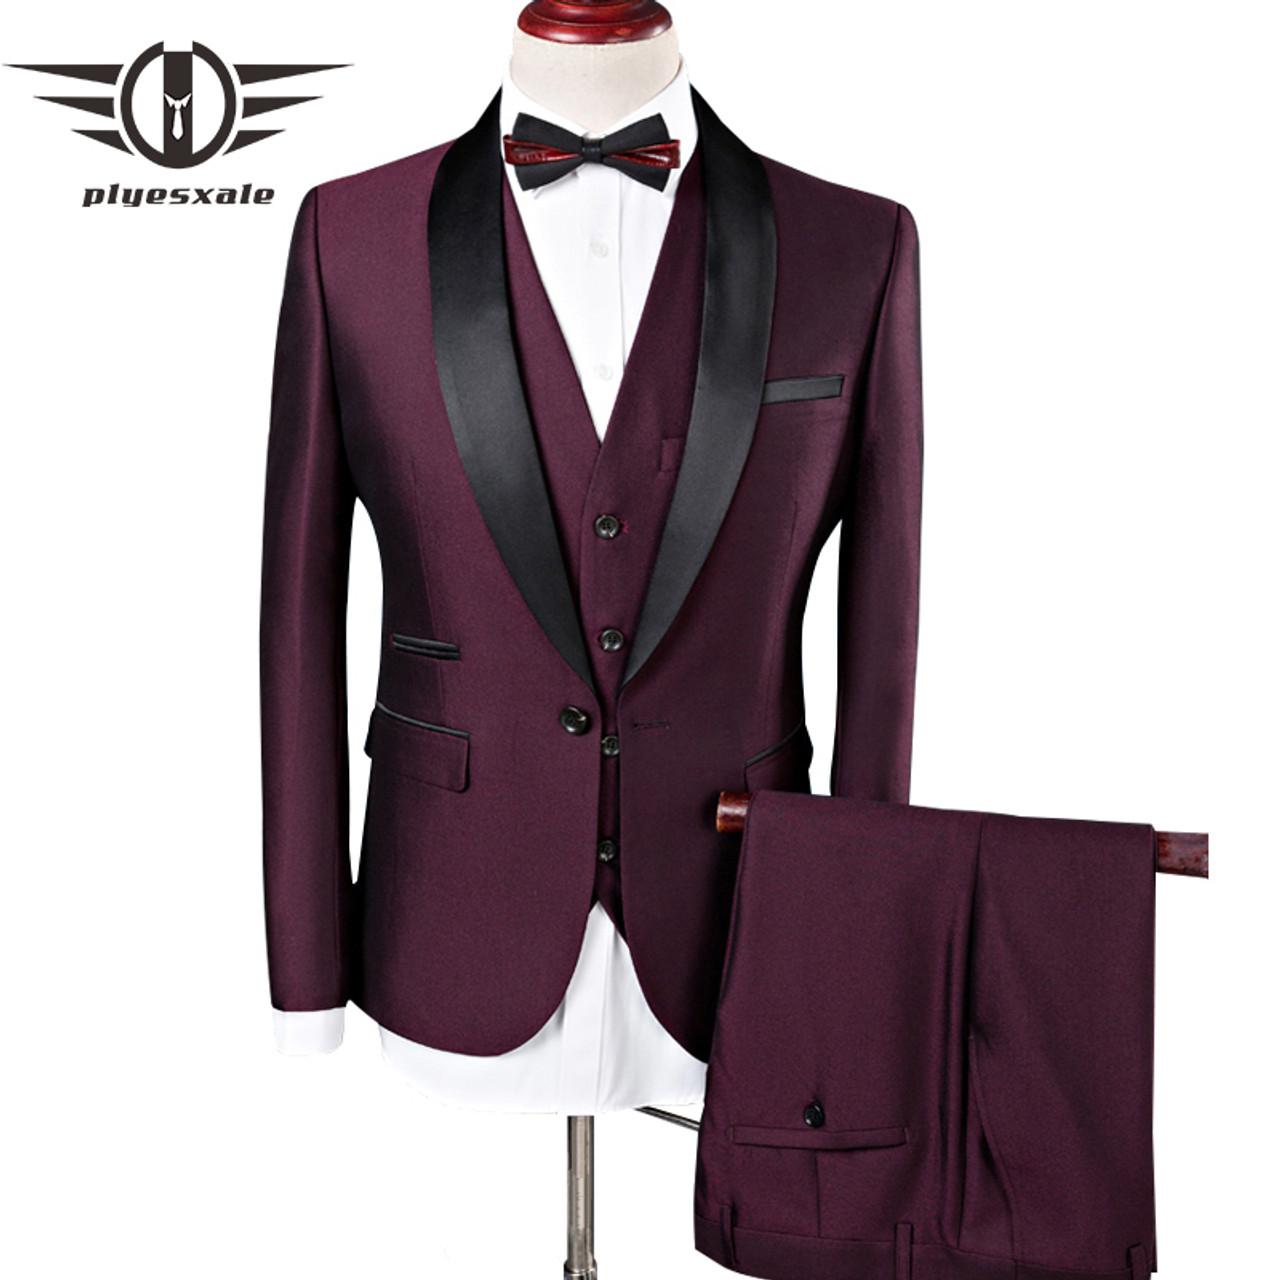 plyesxale men suit 2018 wedding suits for men shawl collar